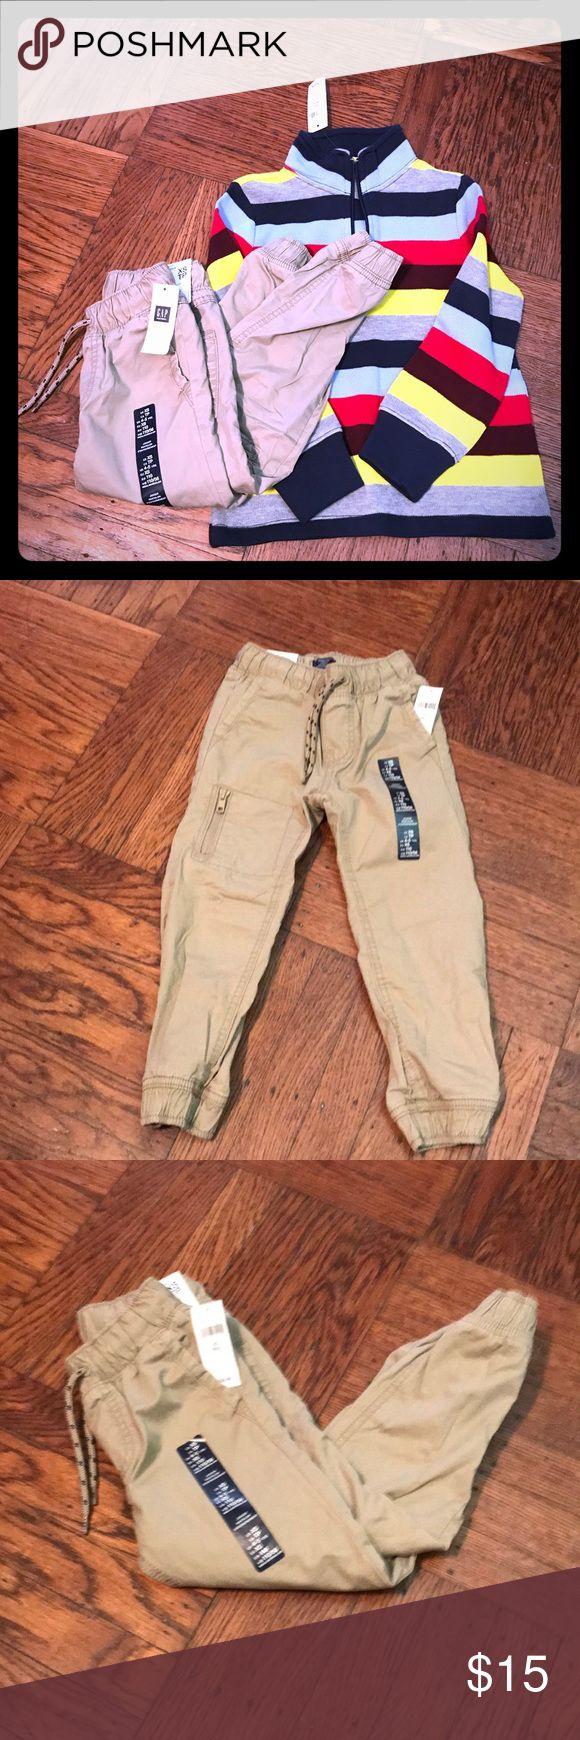 Gap kids khaki jogger pants, Sz XS NWT jogger pants, super versatile and comfy, great with anything! GAP Bottoms Casual